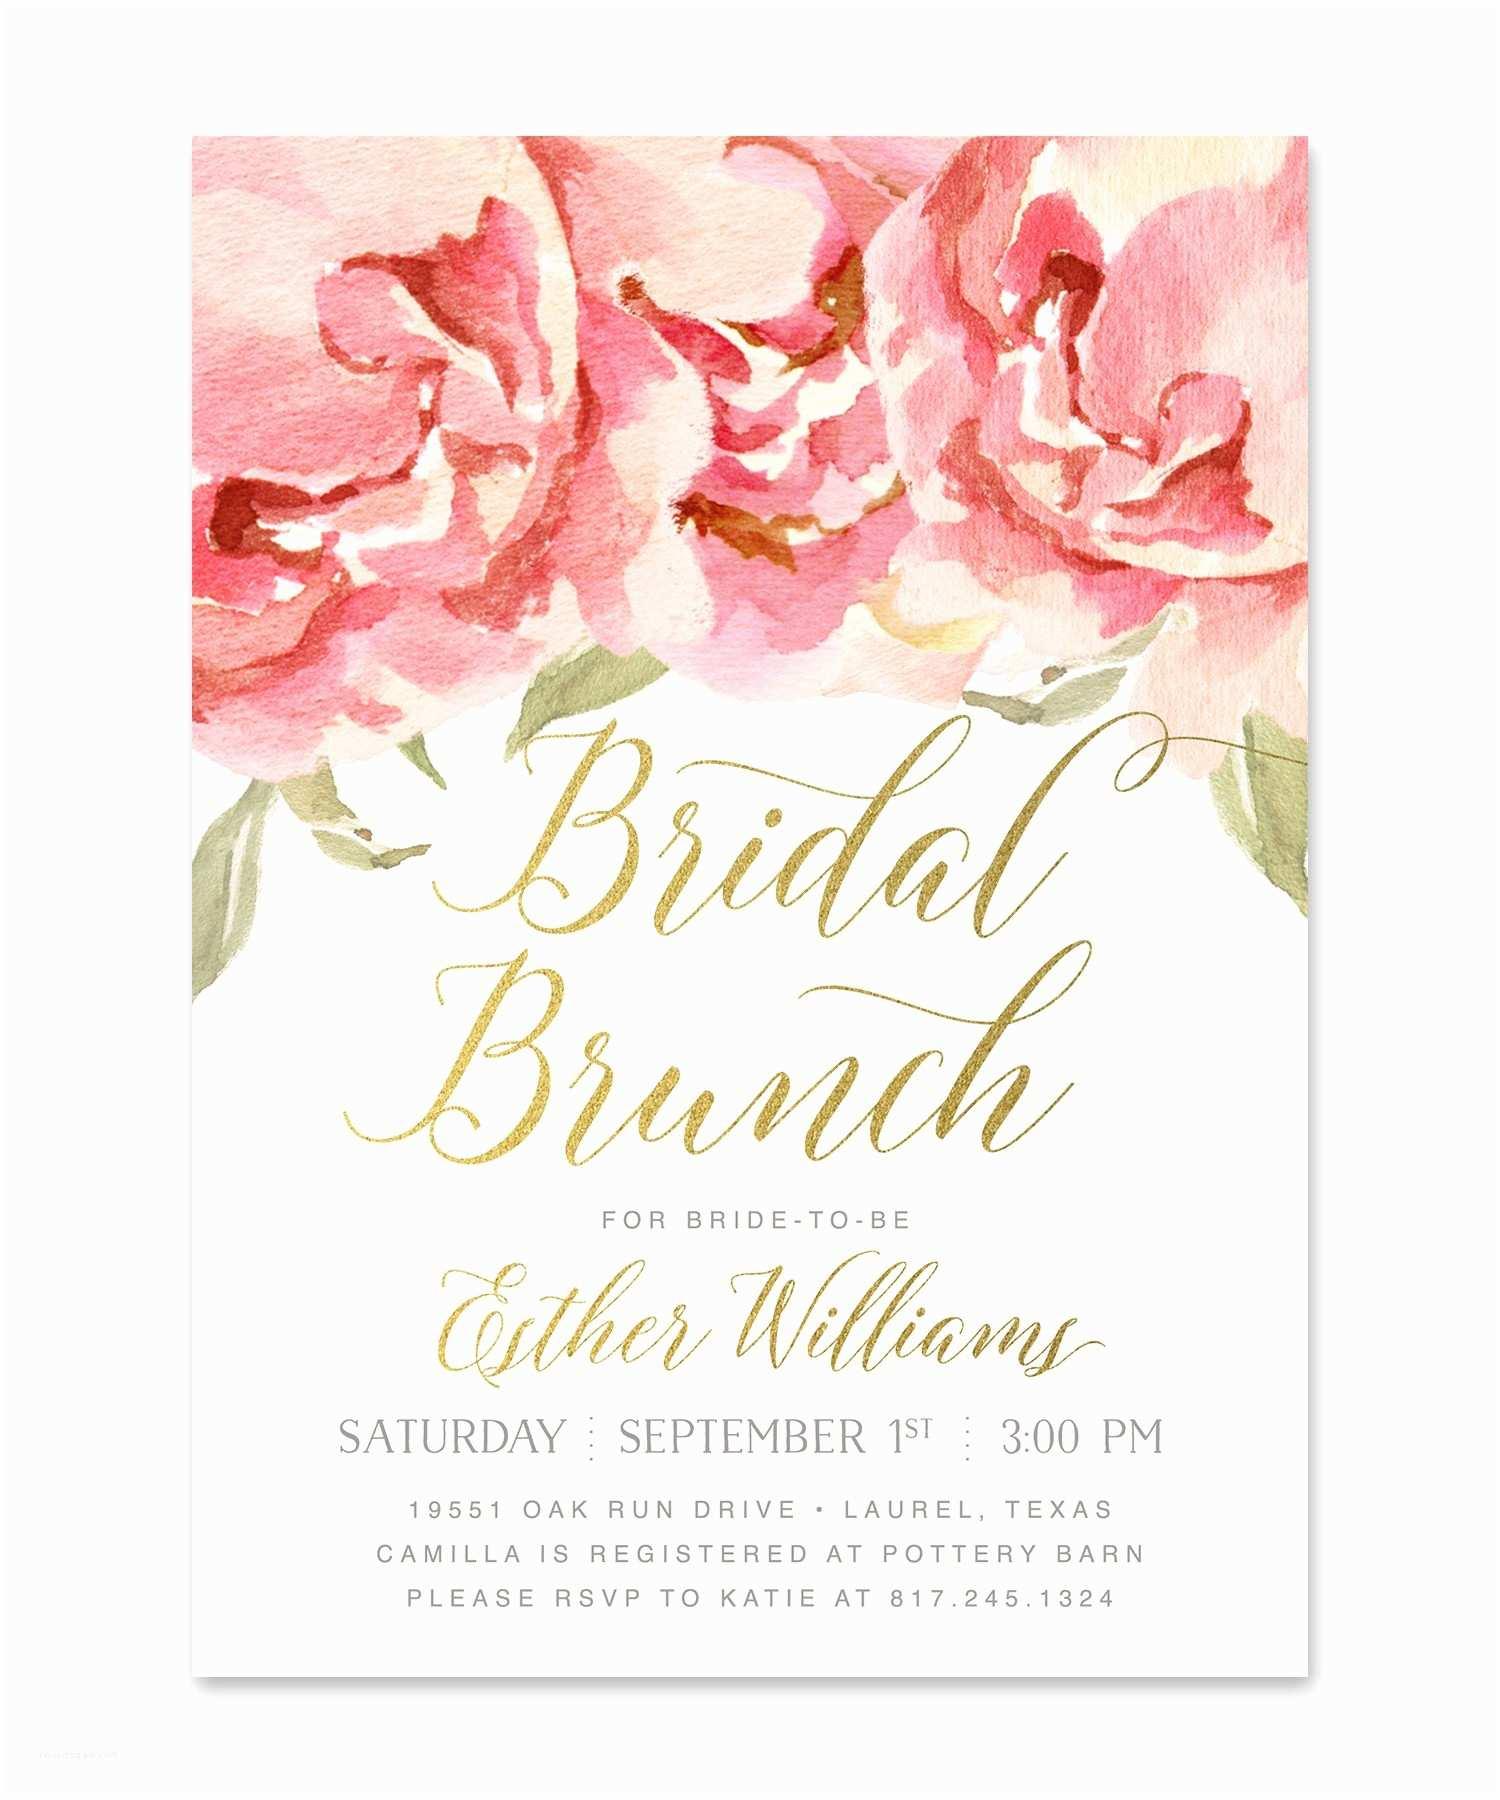 Wedding Brunch Invitations Everly Bridal Shower Brunch Invitation Pink Roses & Gold